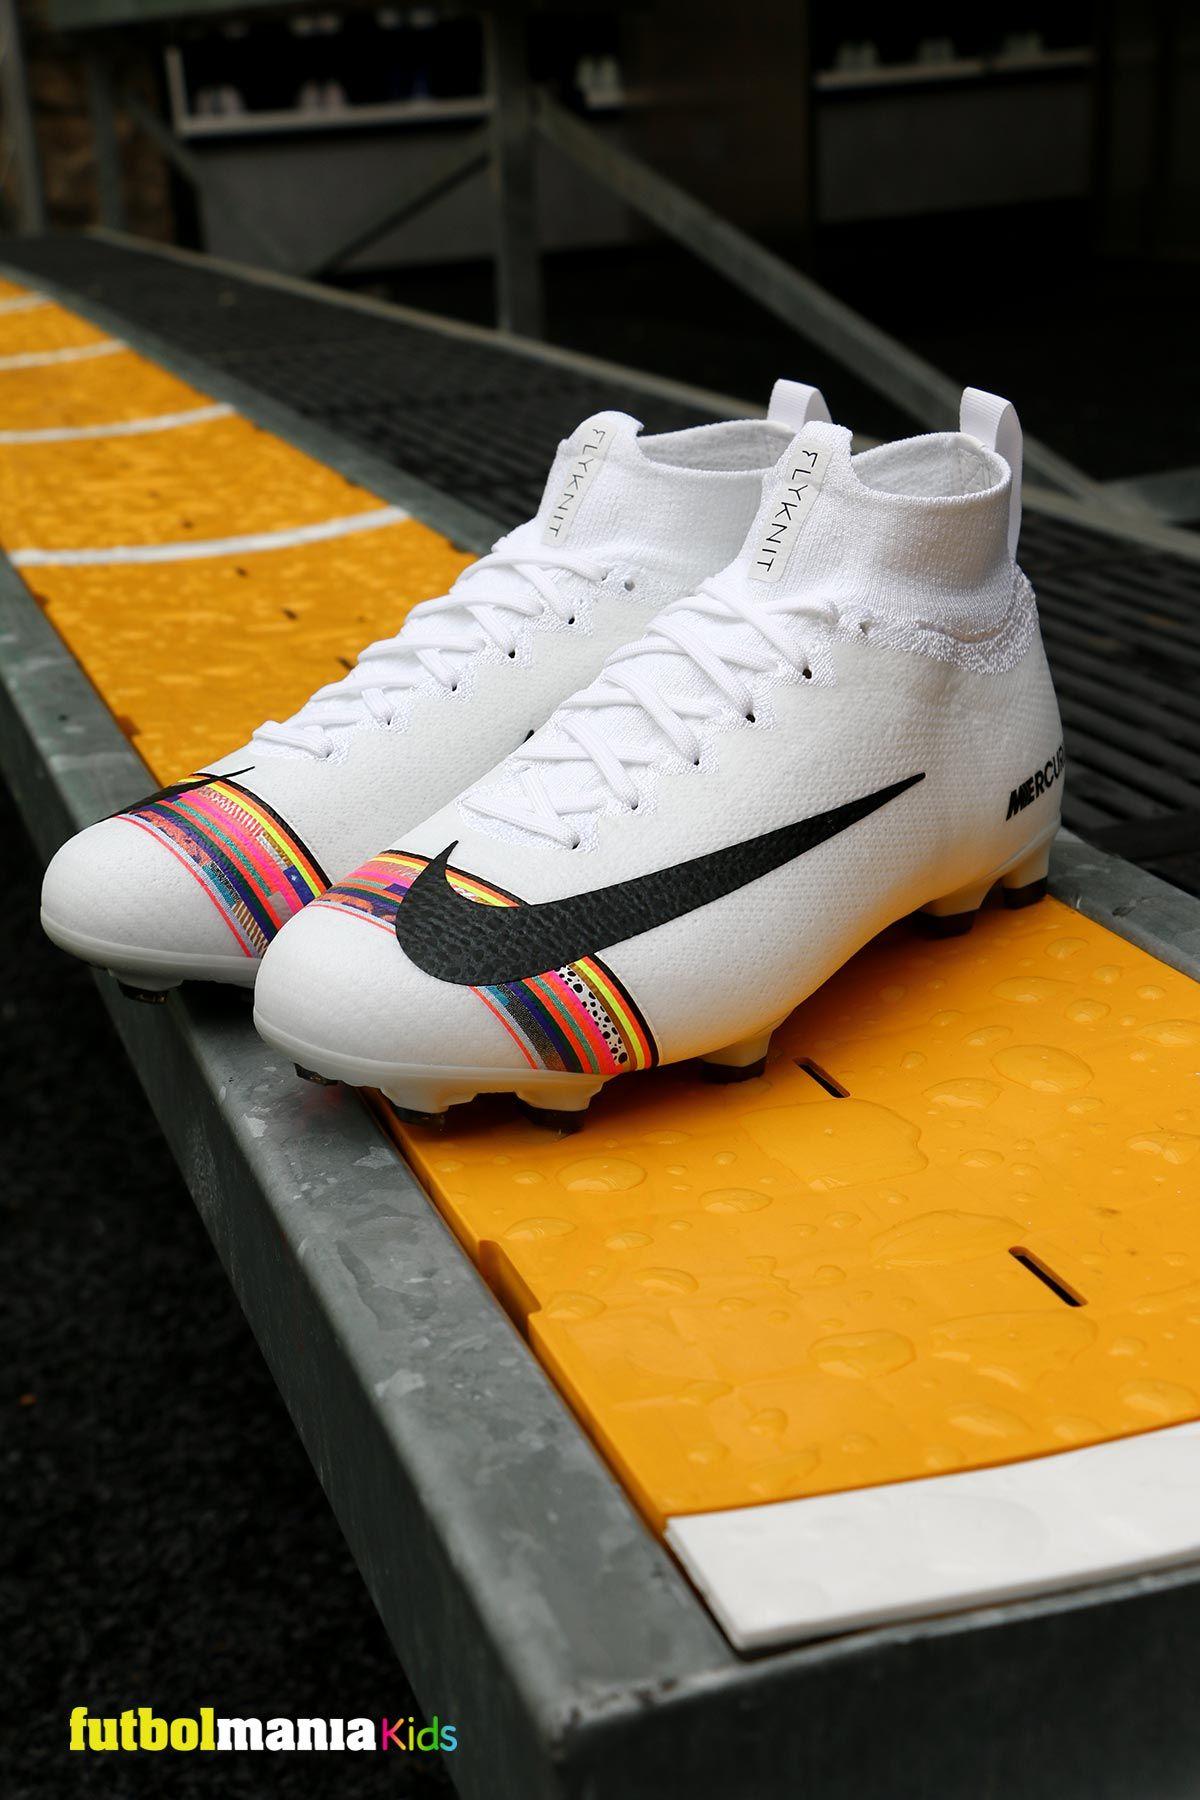 pretty nice 6f5cc 7c0e5 Botas de fútbol con tobillera Nike Mercurial Superfly VI ...